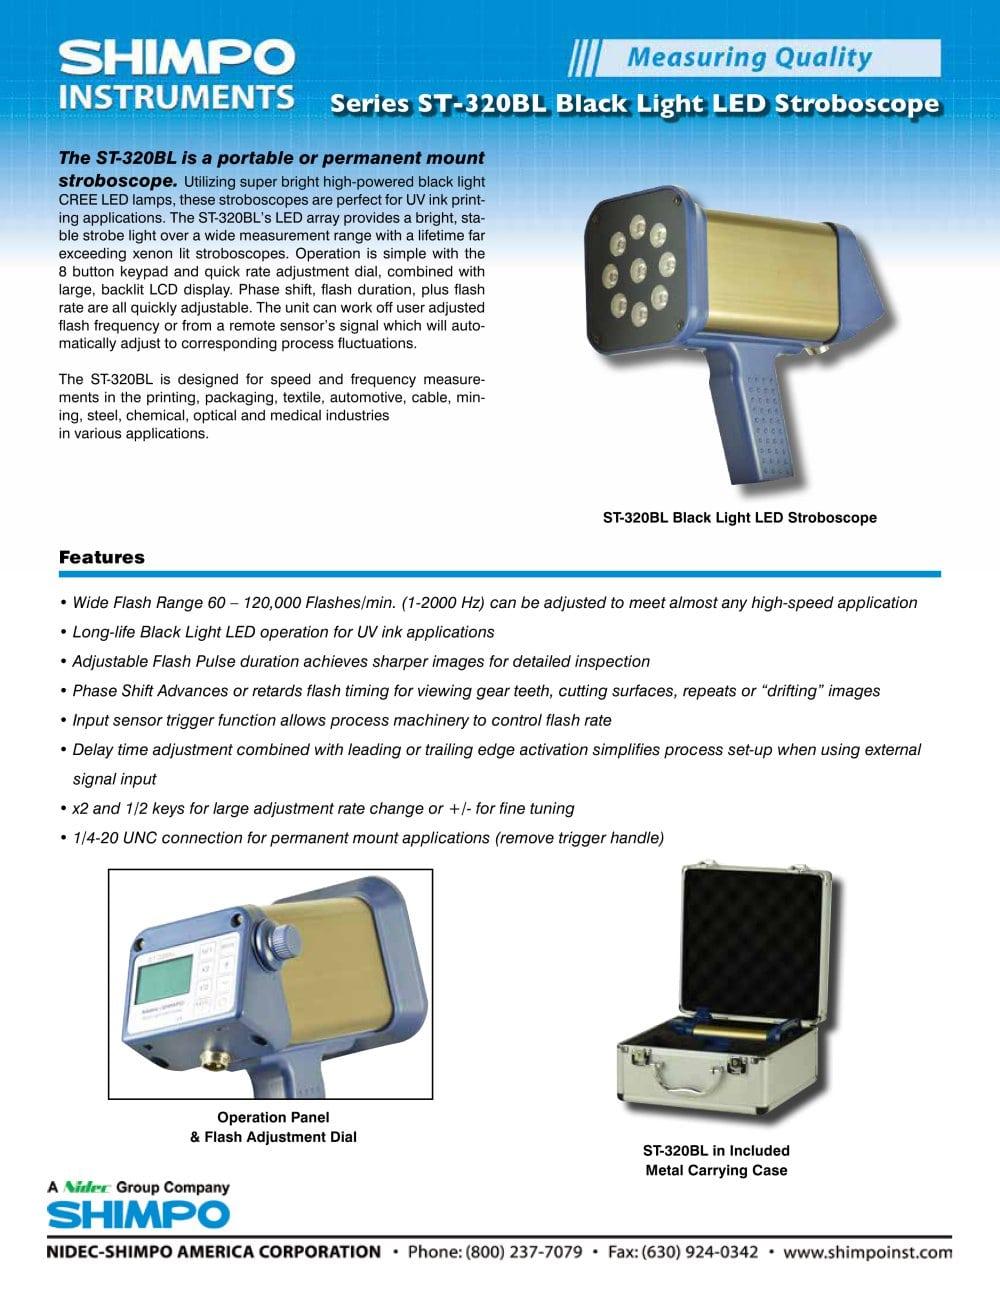 St 320bl Uv Black Light Led Stroboscope Nidec Shimpo Pdf Strobe 1 2 Pages